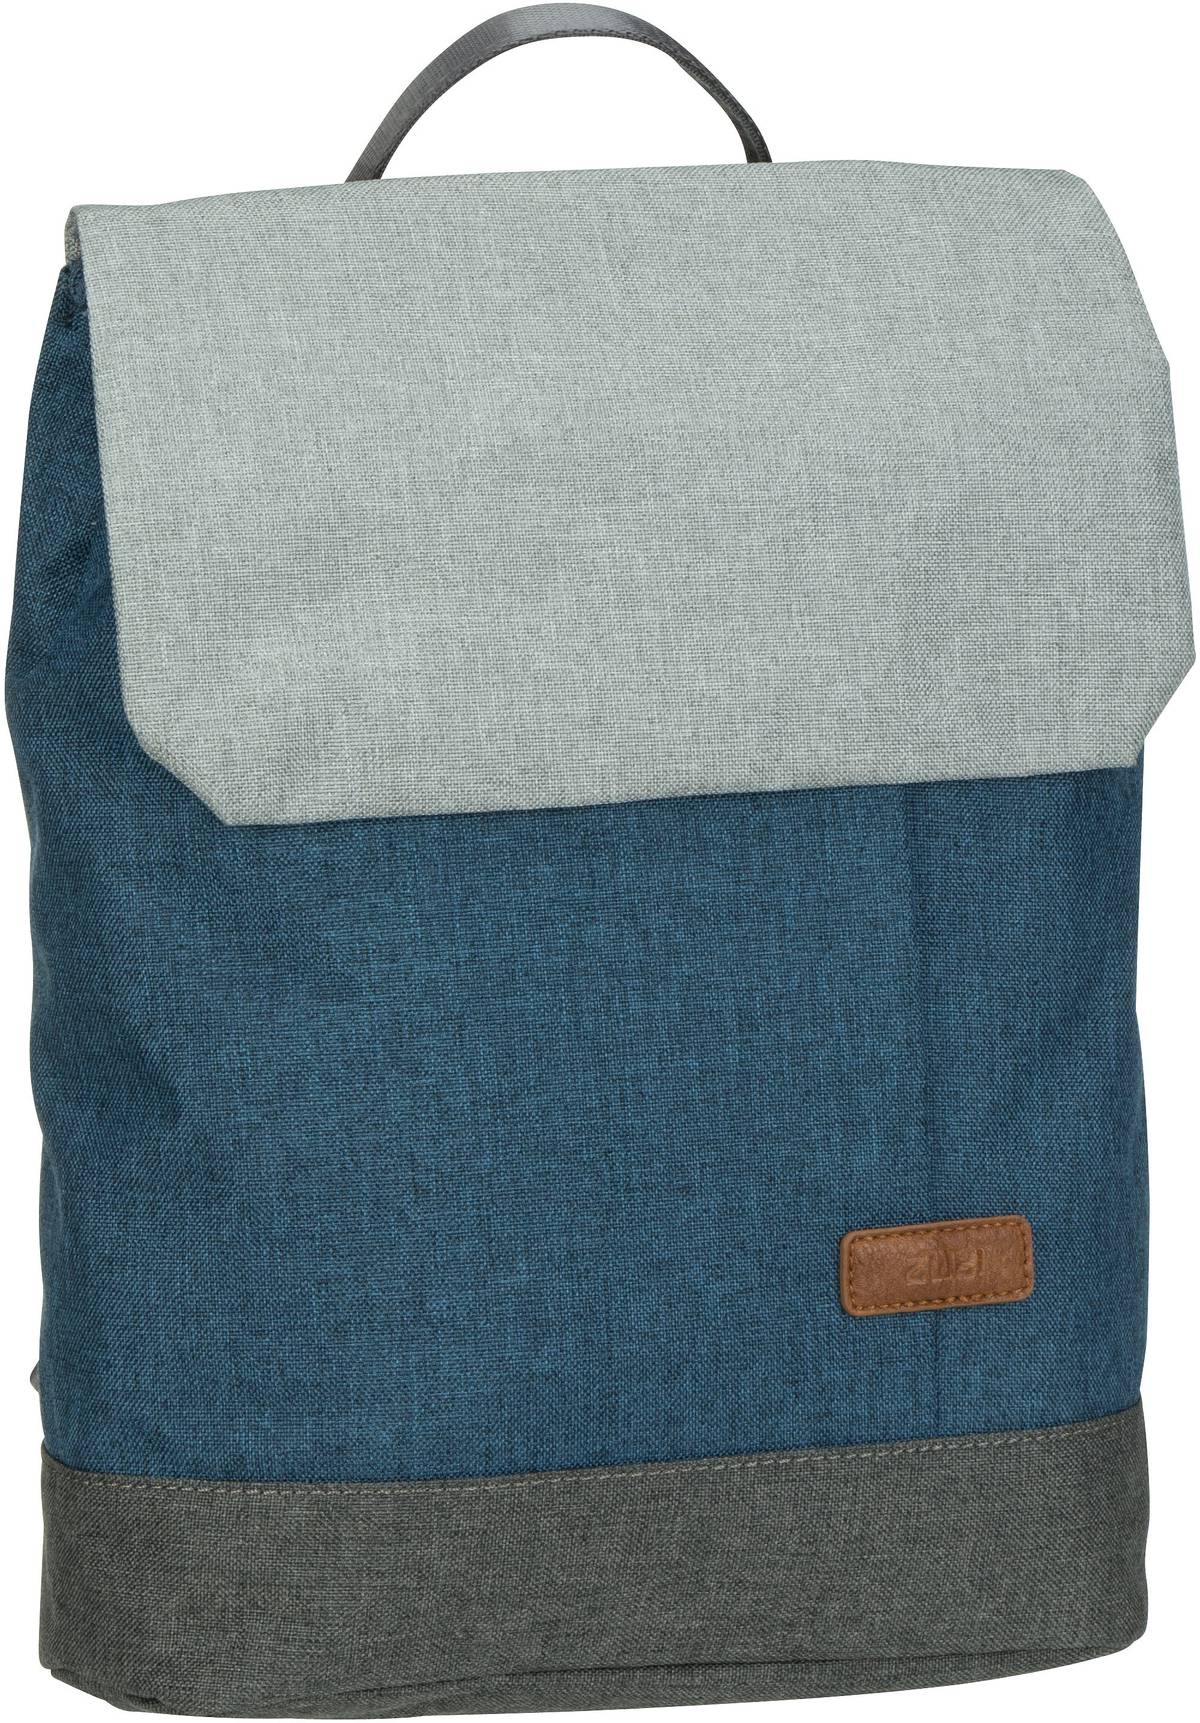 Rucksack / Daypack Benno BE130 Blue (7 Liter)